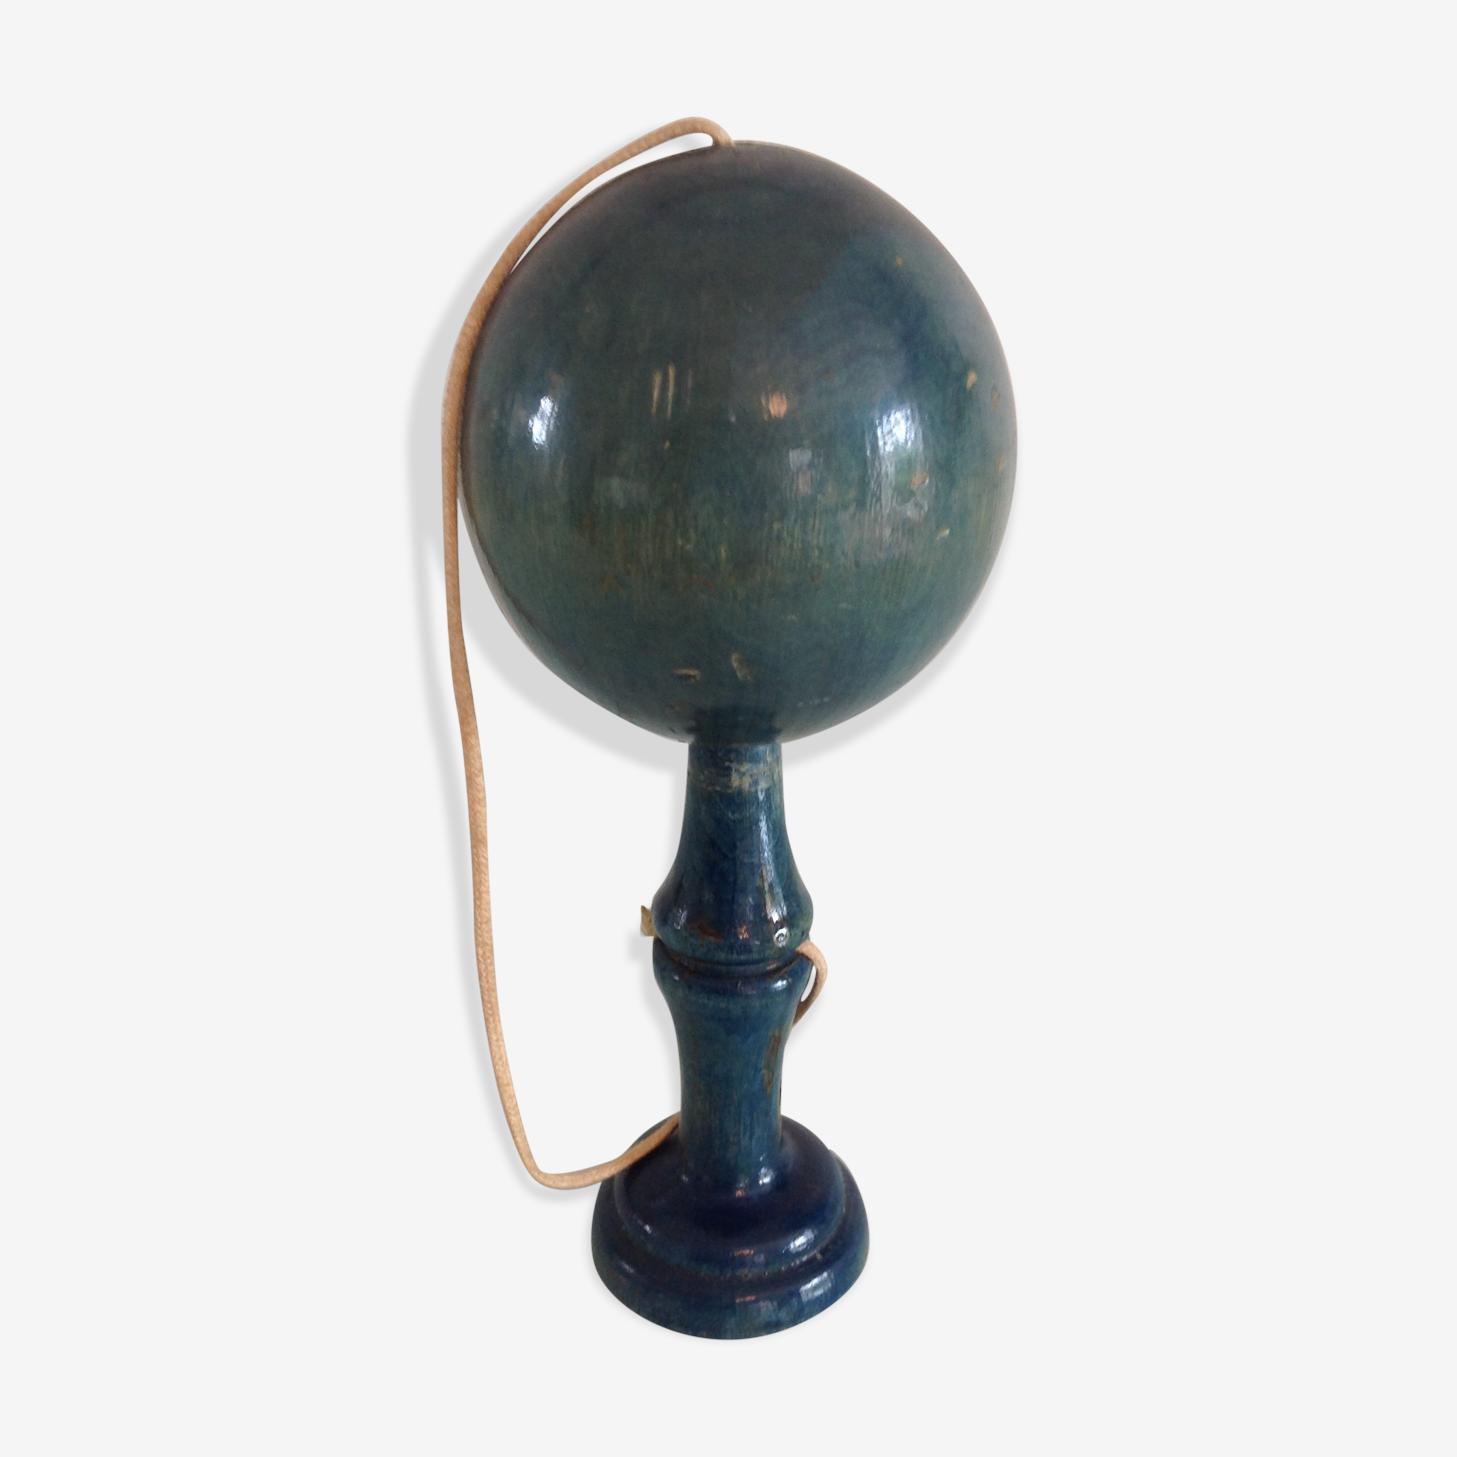 Ancien bilboquet en bois peint bleu